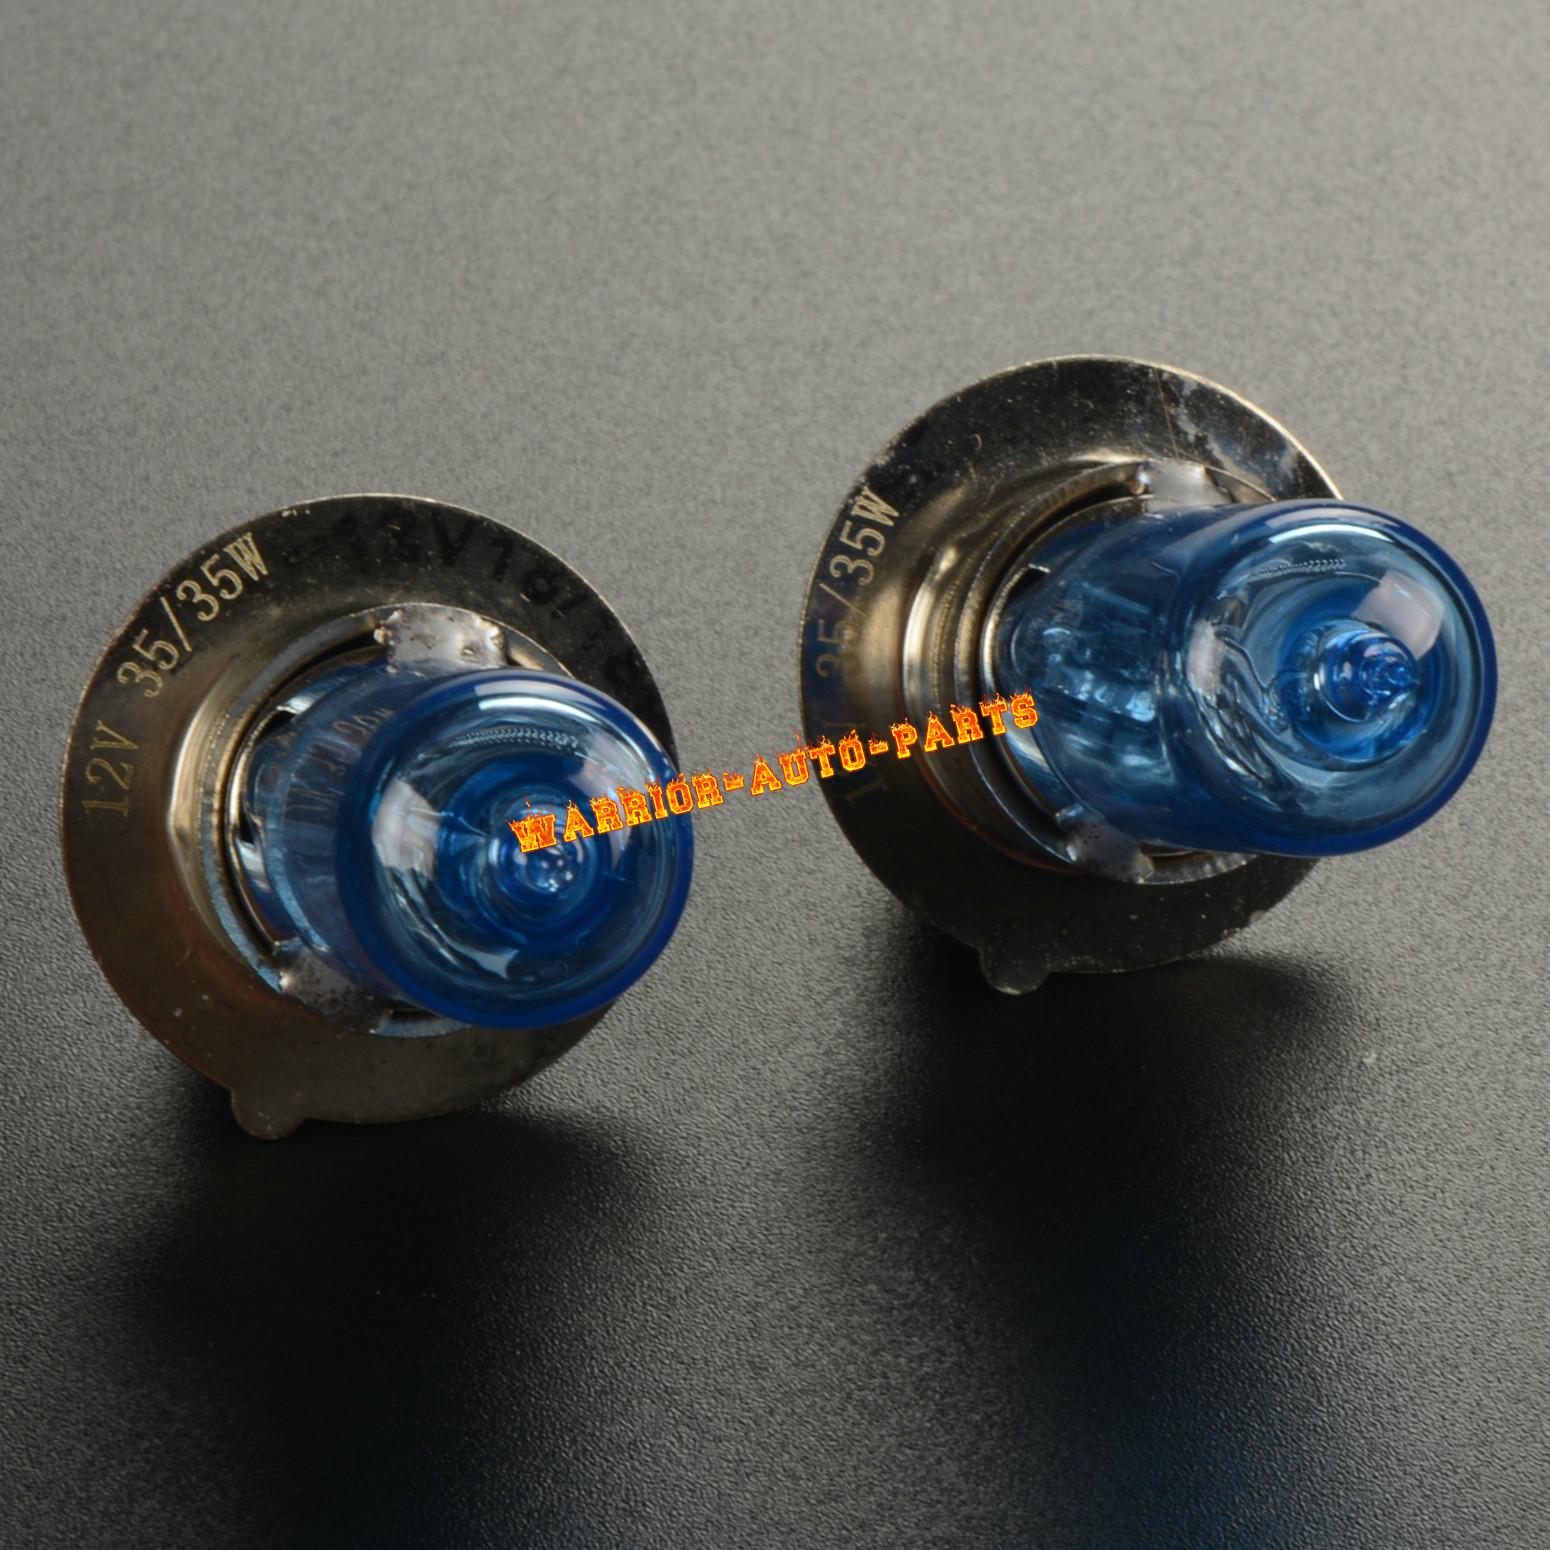 For Honda Sportrax 300 400 EX Super White Headlight Bulbs ATV 1999 2000 01 02 x2